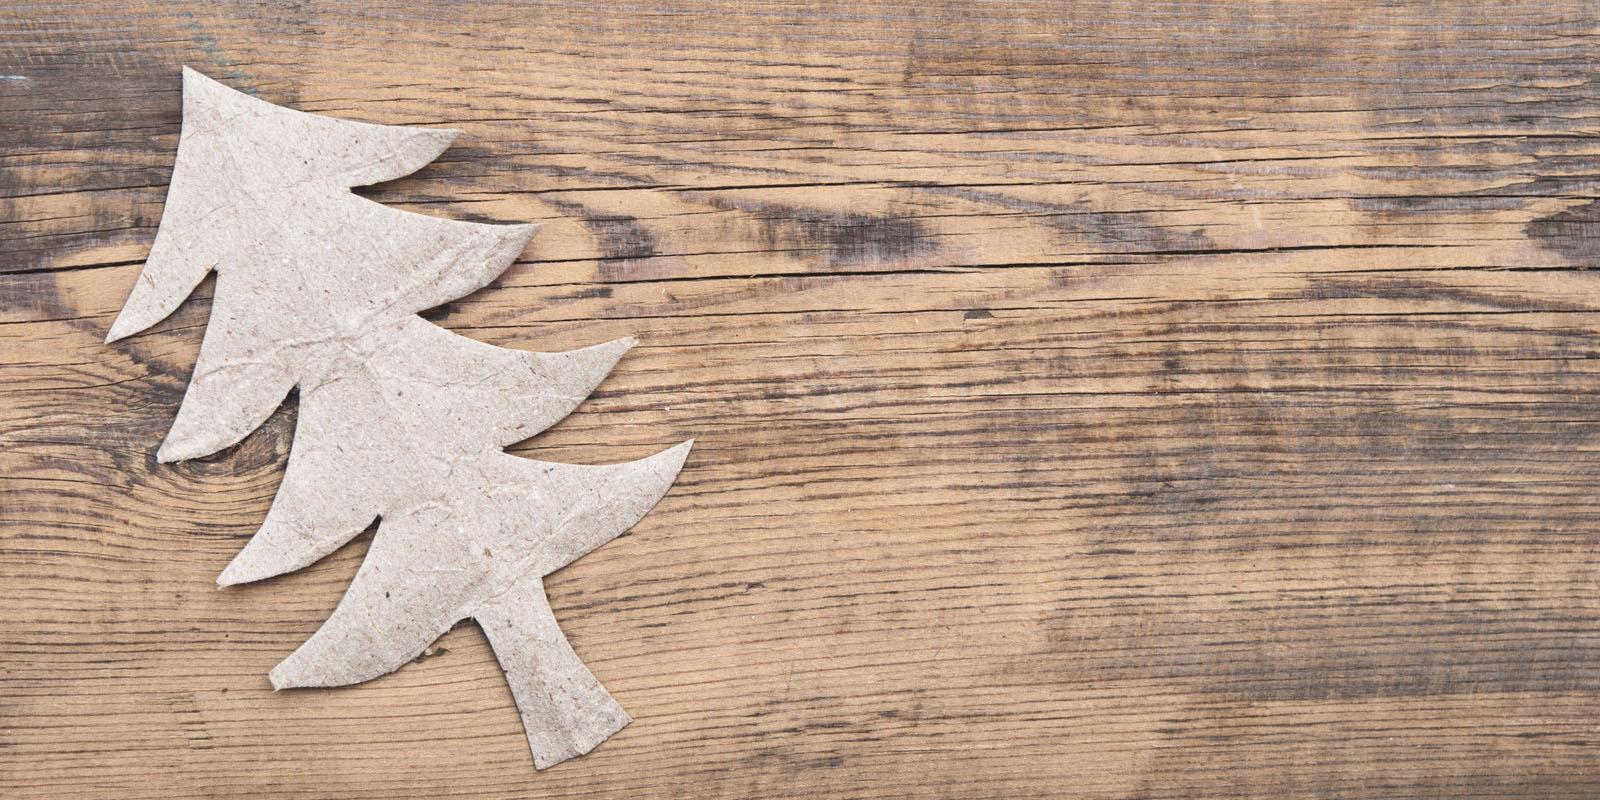 Baltimore County Christmas Tree Recycling Program